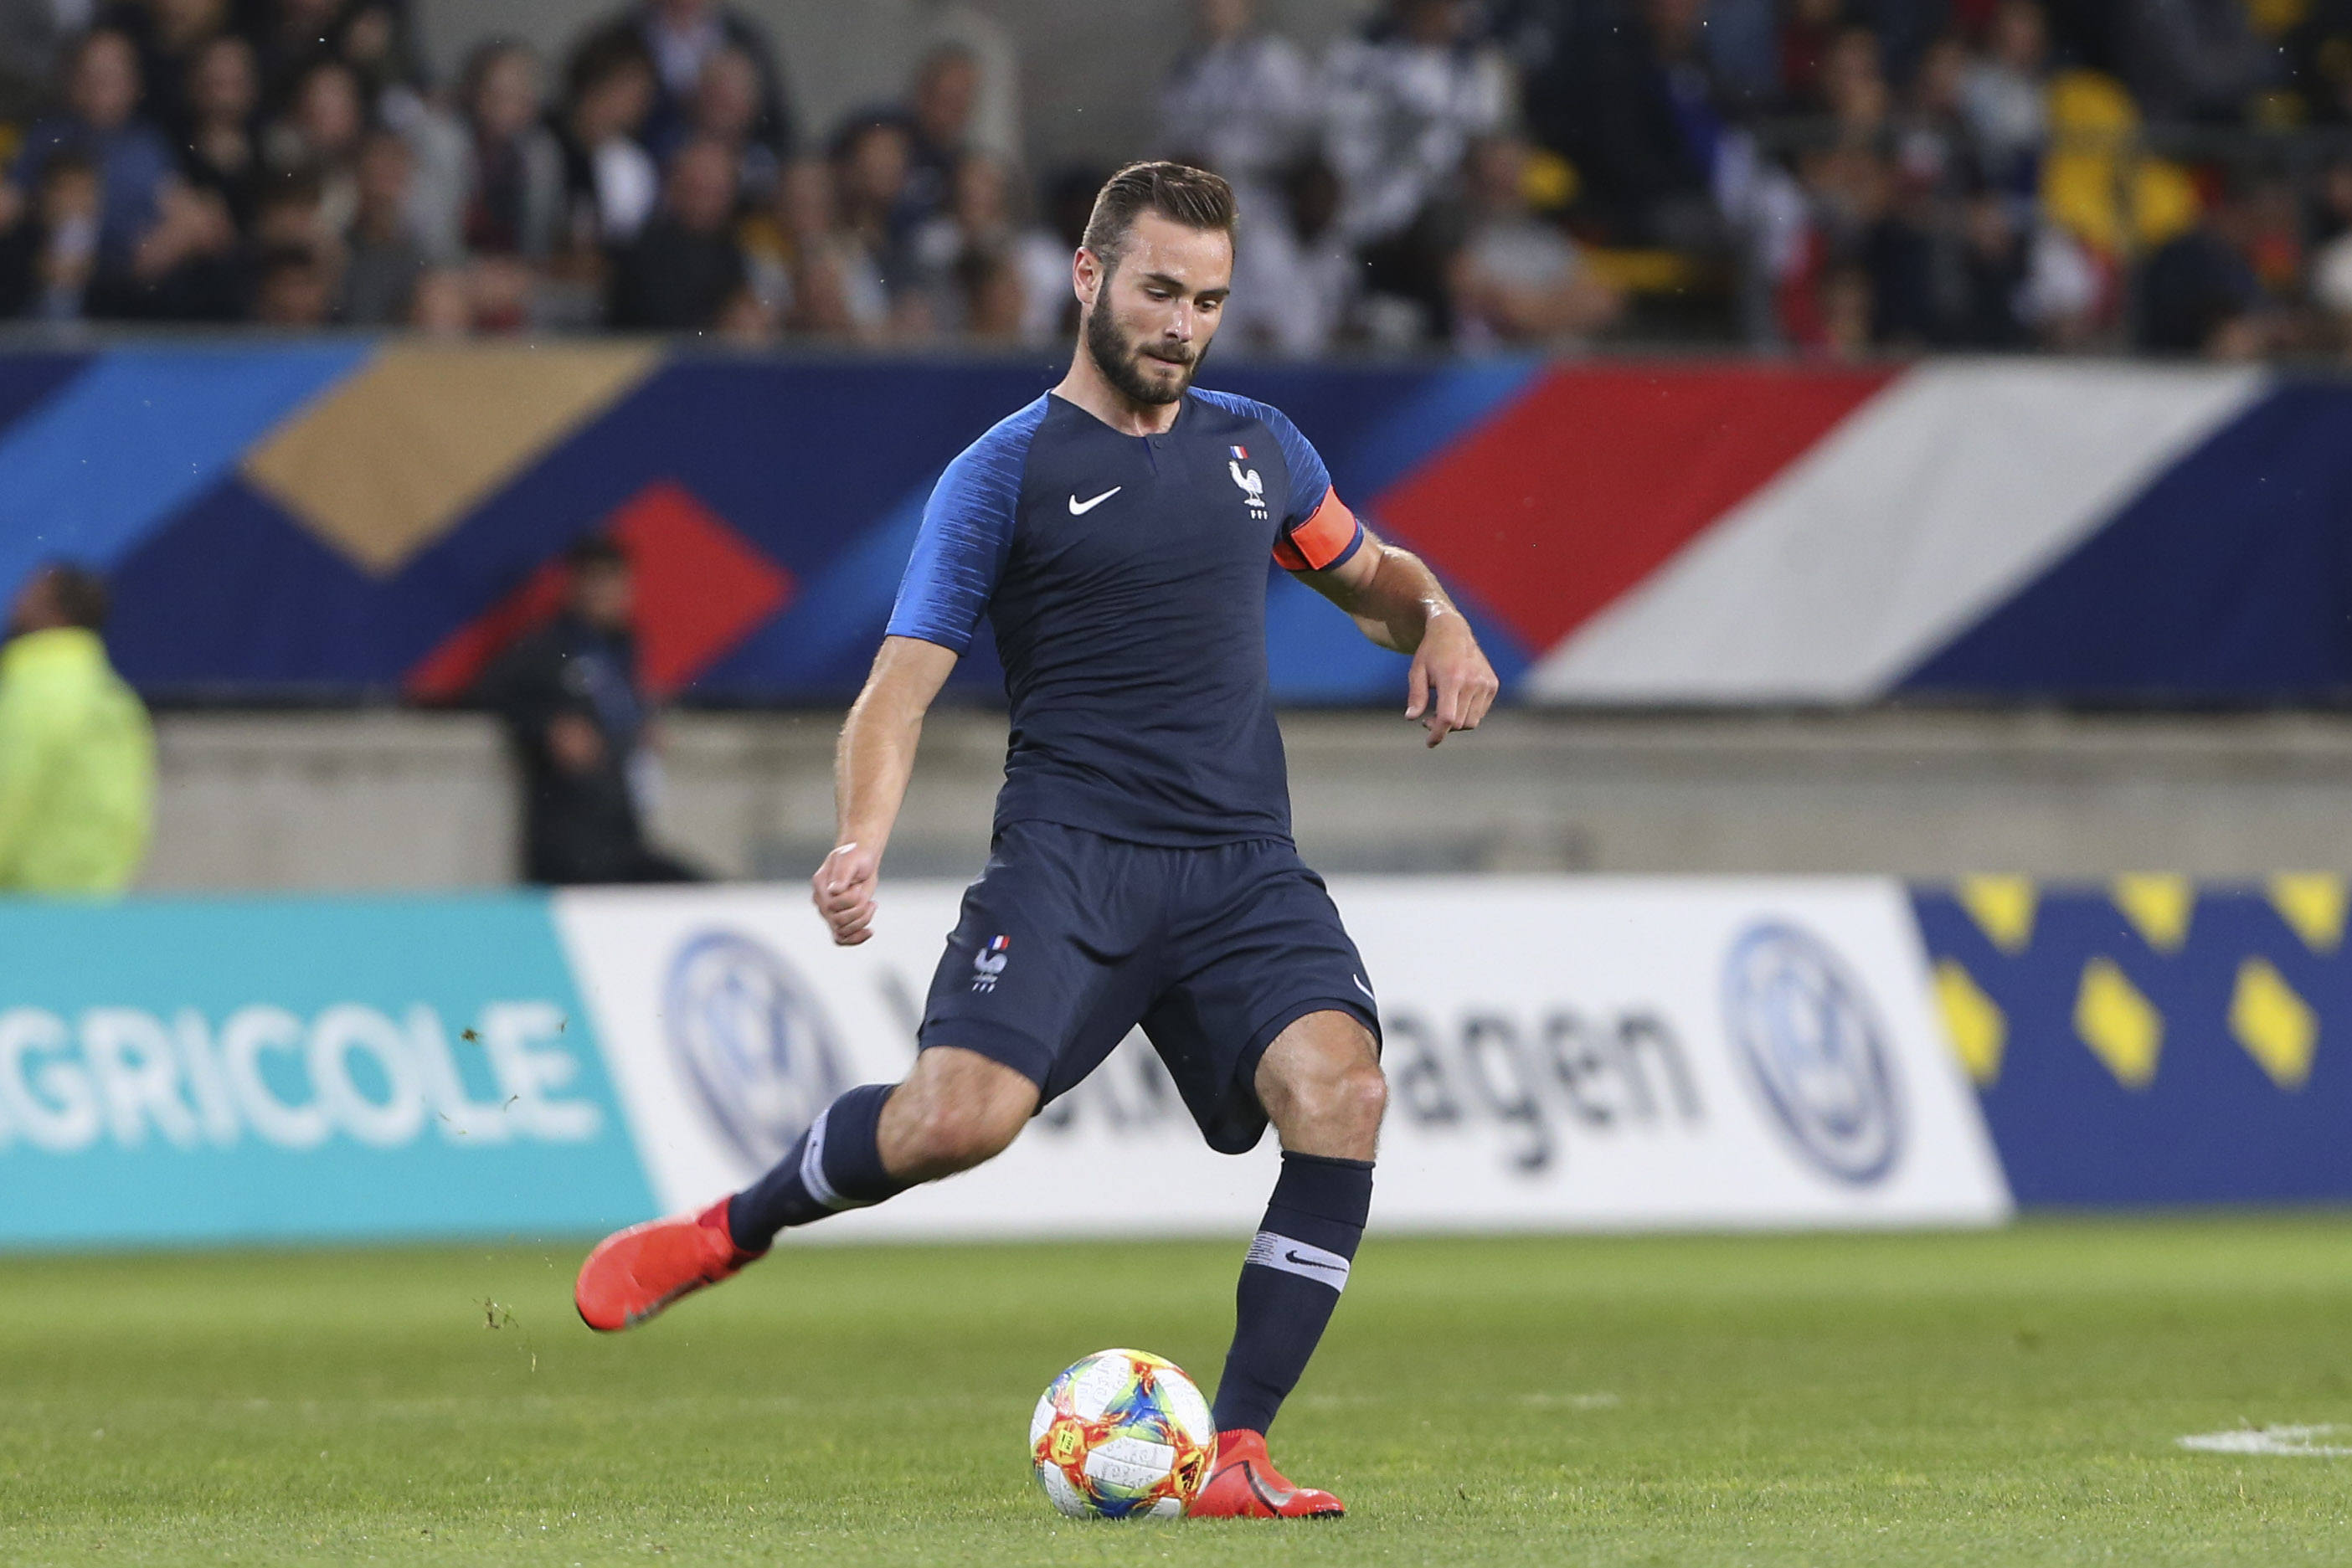 Football - Equipe de France - Euro Espoirs : Les Bleuets ont leur destin en main